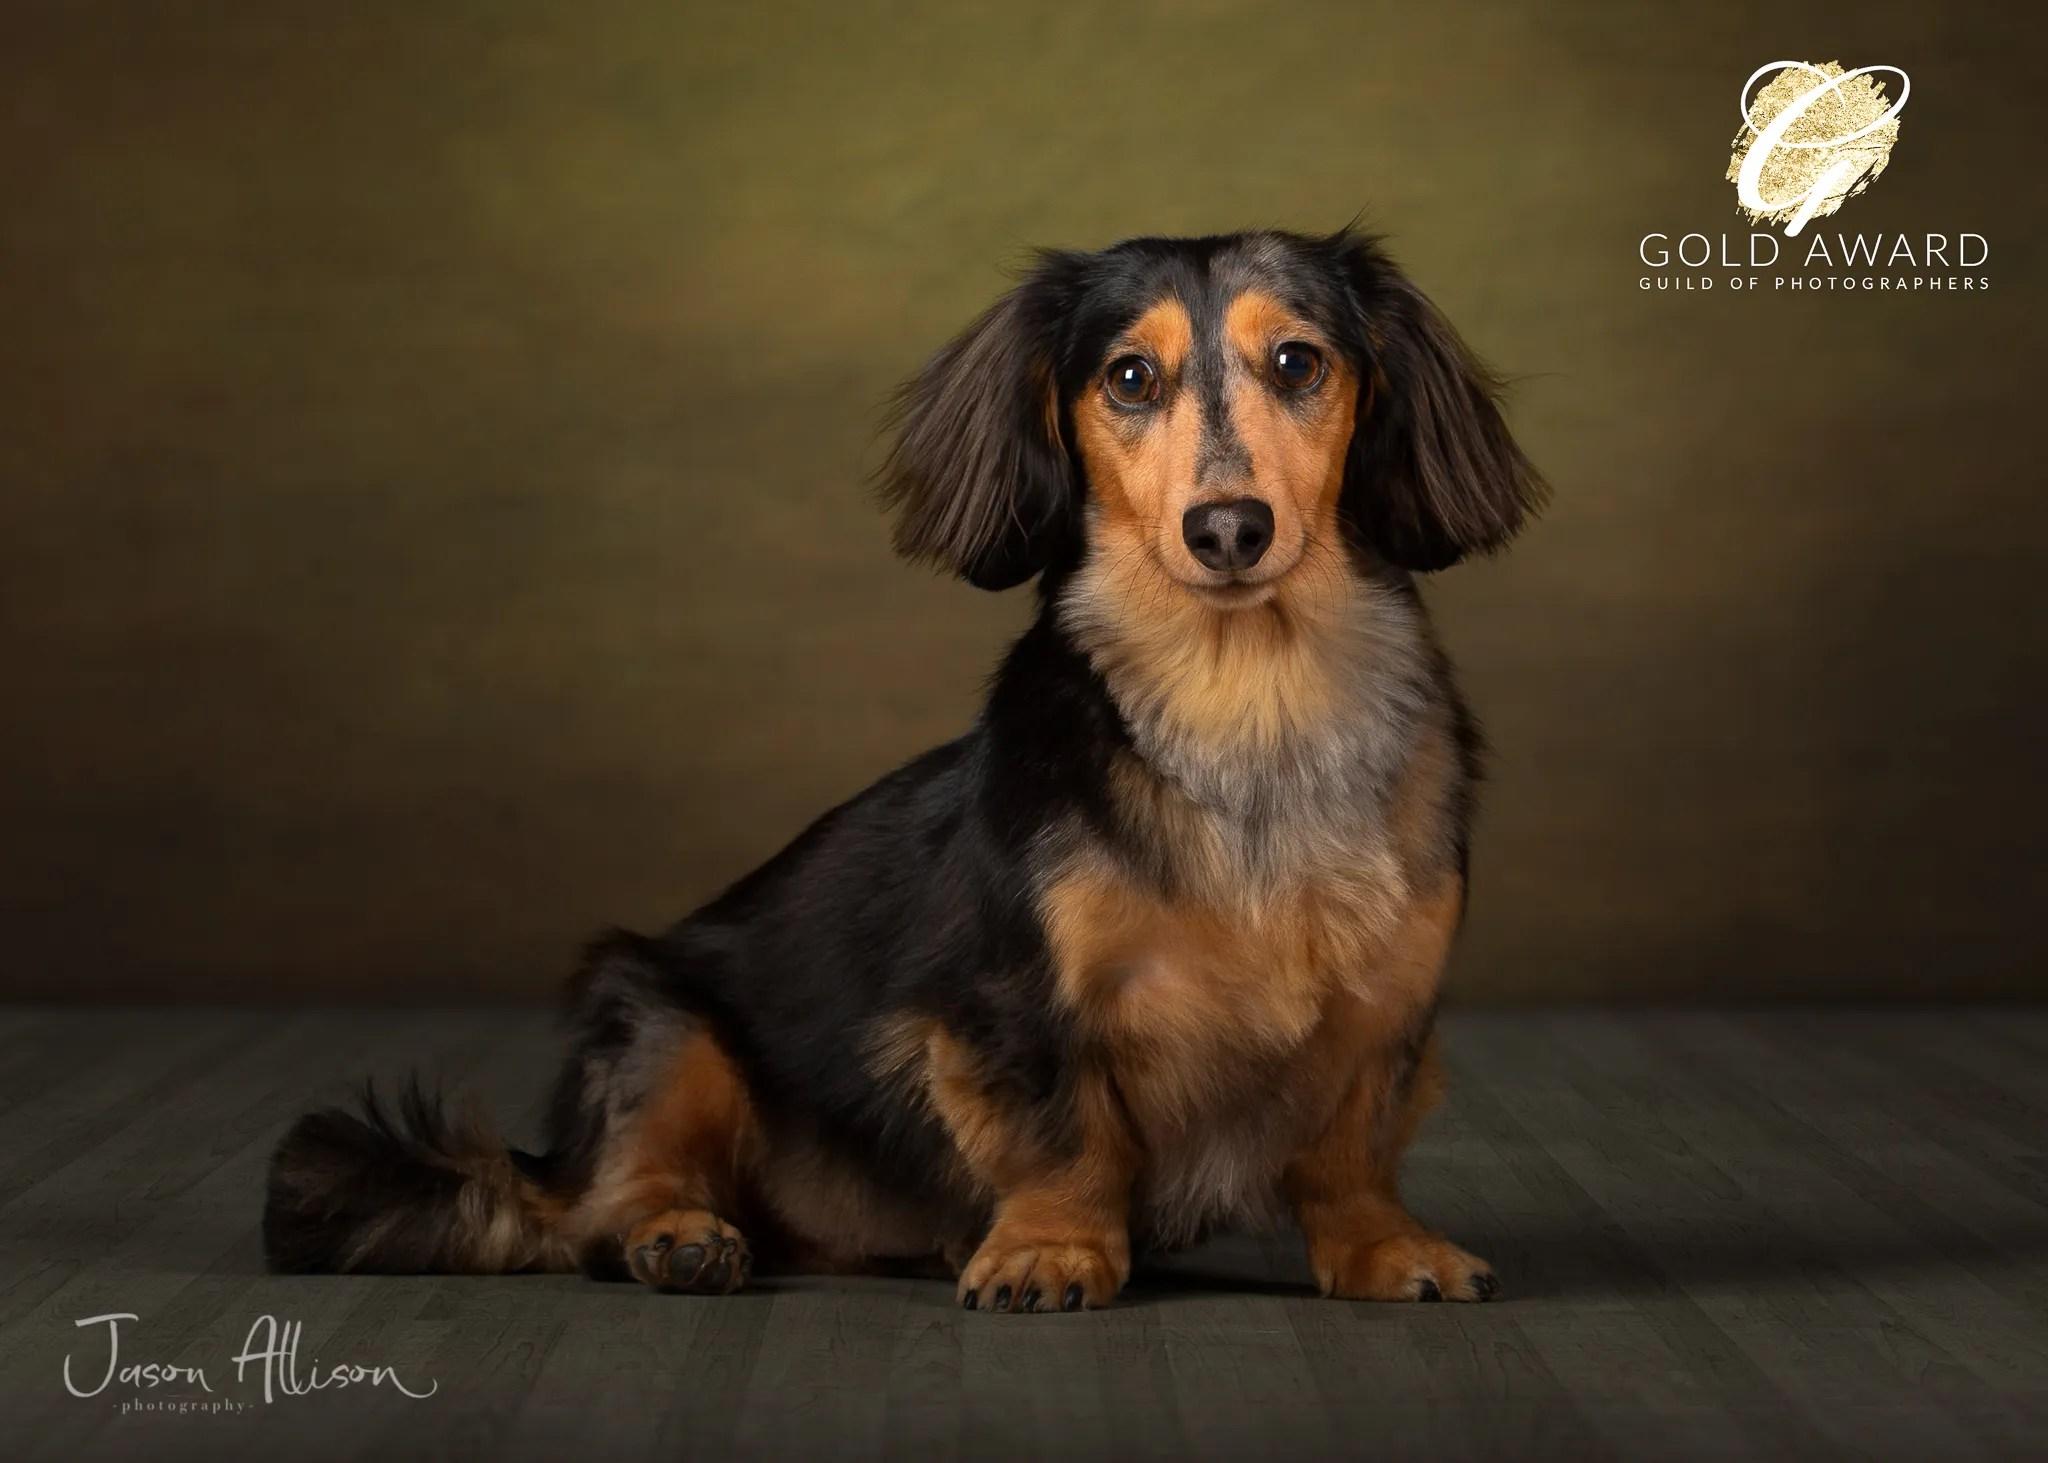 Bailey the Dachshund by Jason Allison